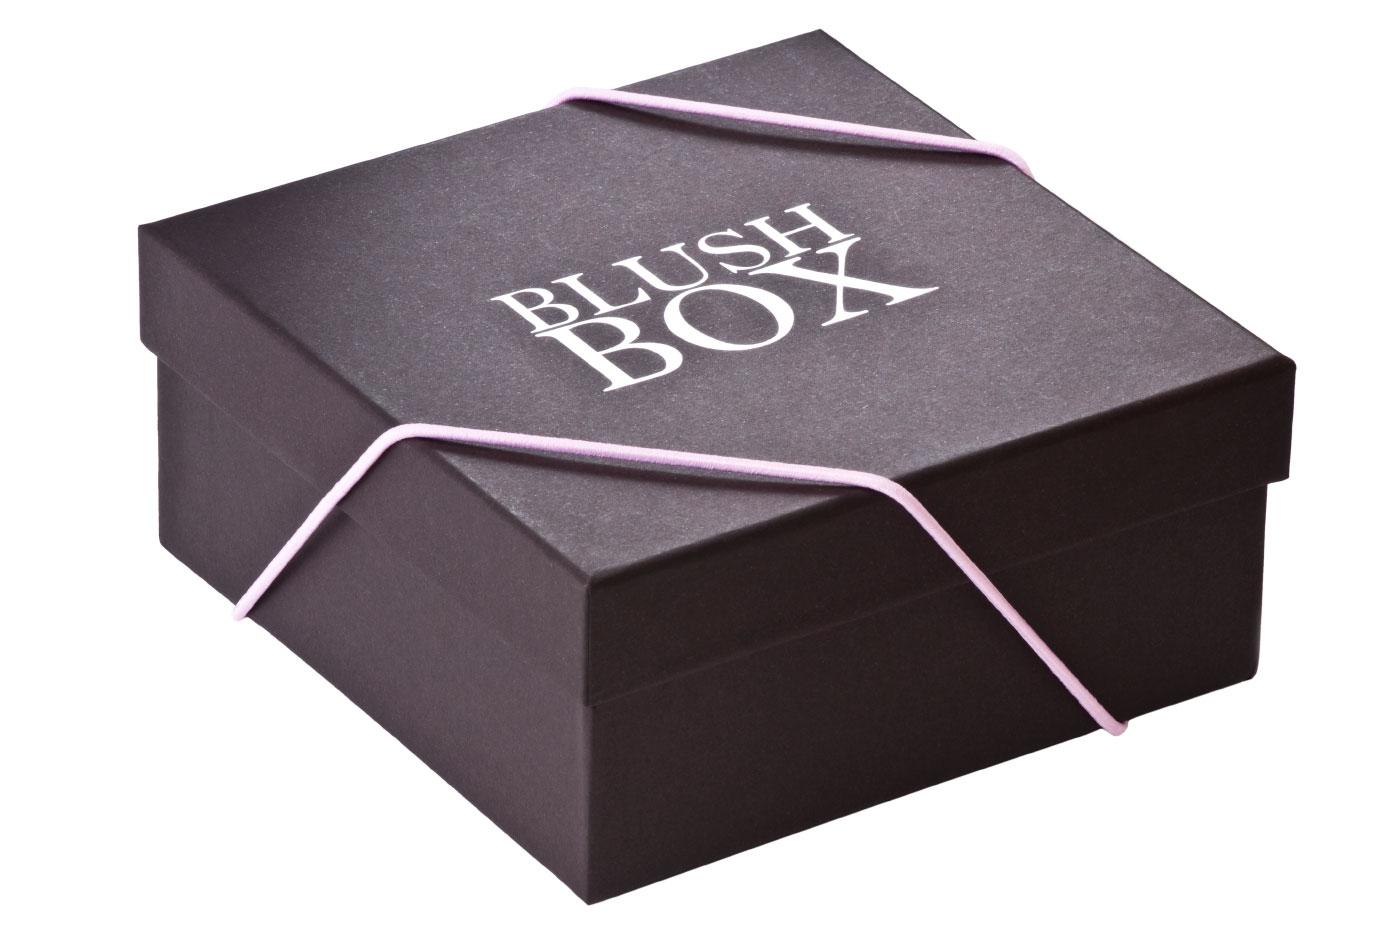 blushbox003-2-300x199